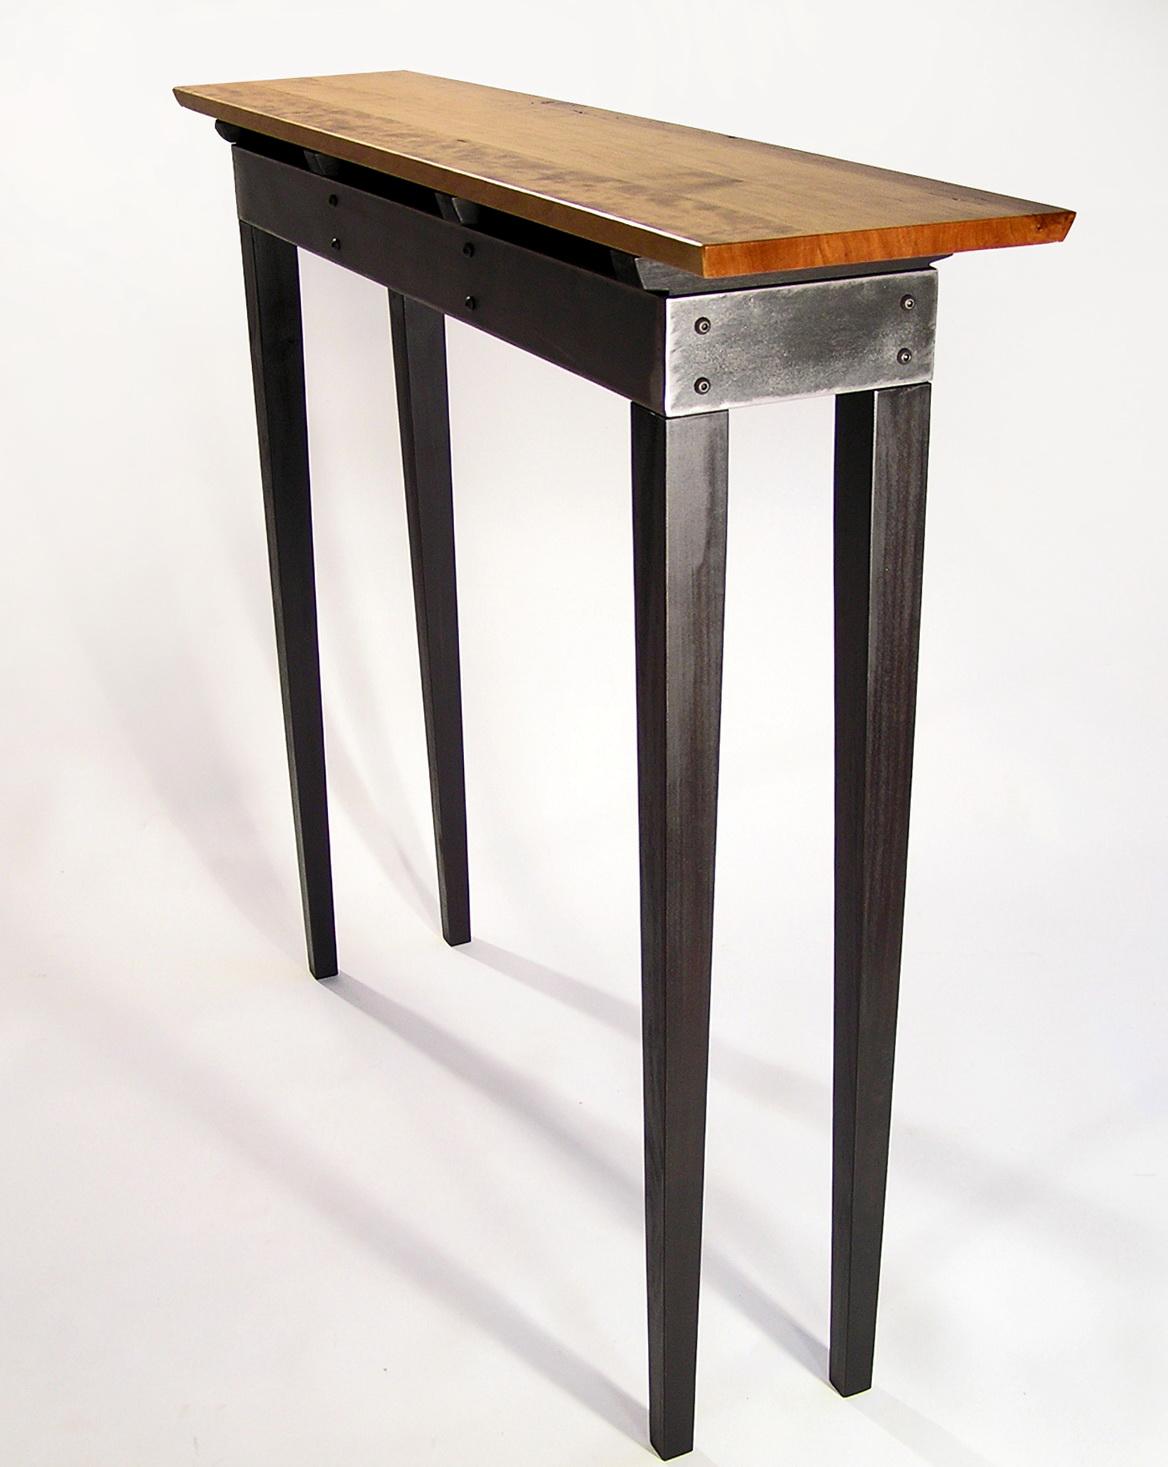 Metal Bench Legs Contemporary